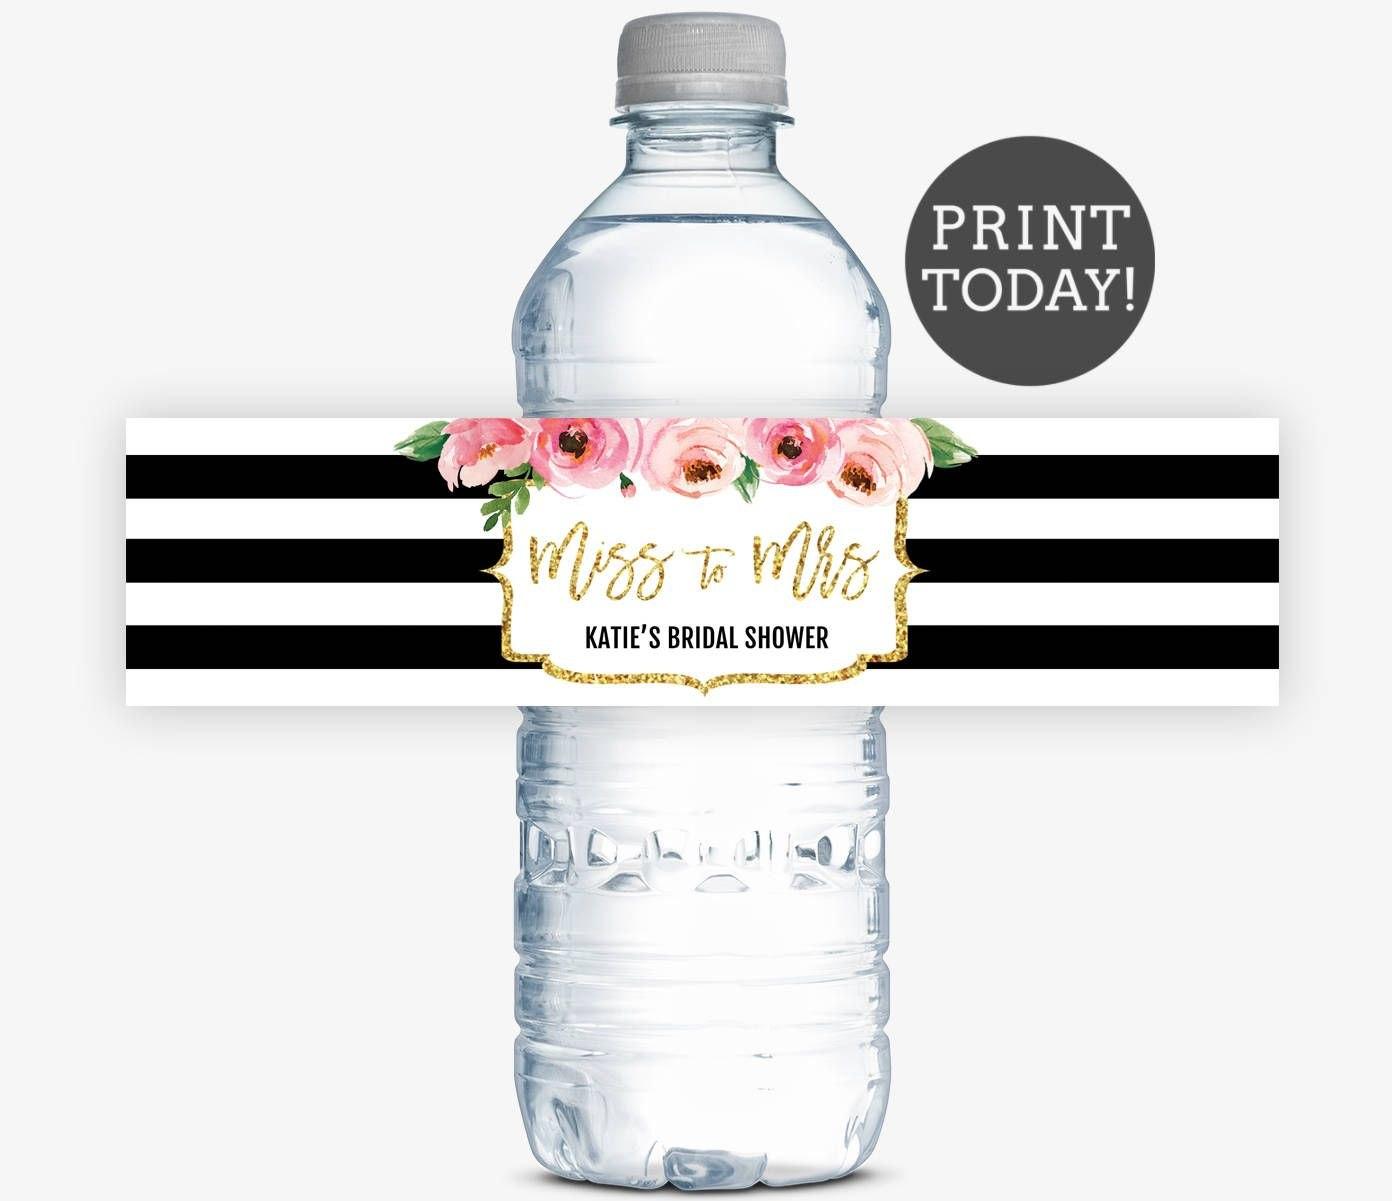 Kate Bridal Shower Water Bottle Labels Spade Inspired Bridal Shower With Regard To Diy Water Bottle Label Template